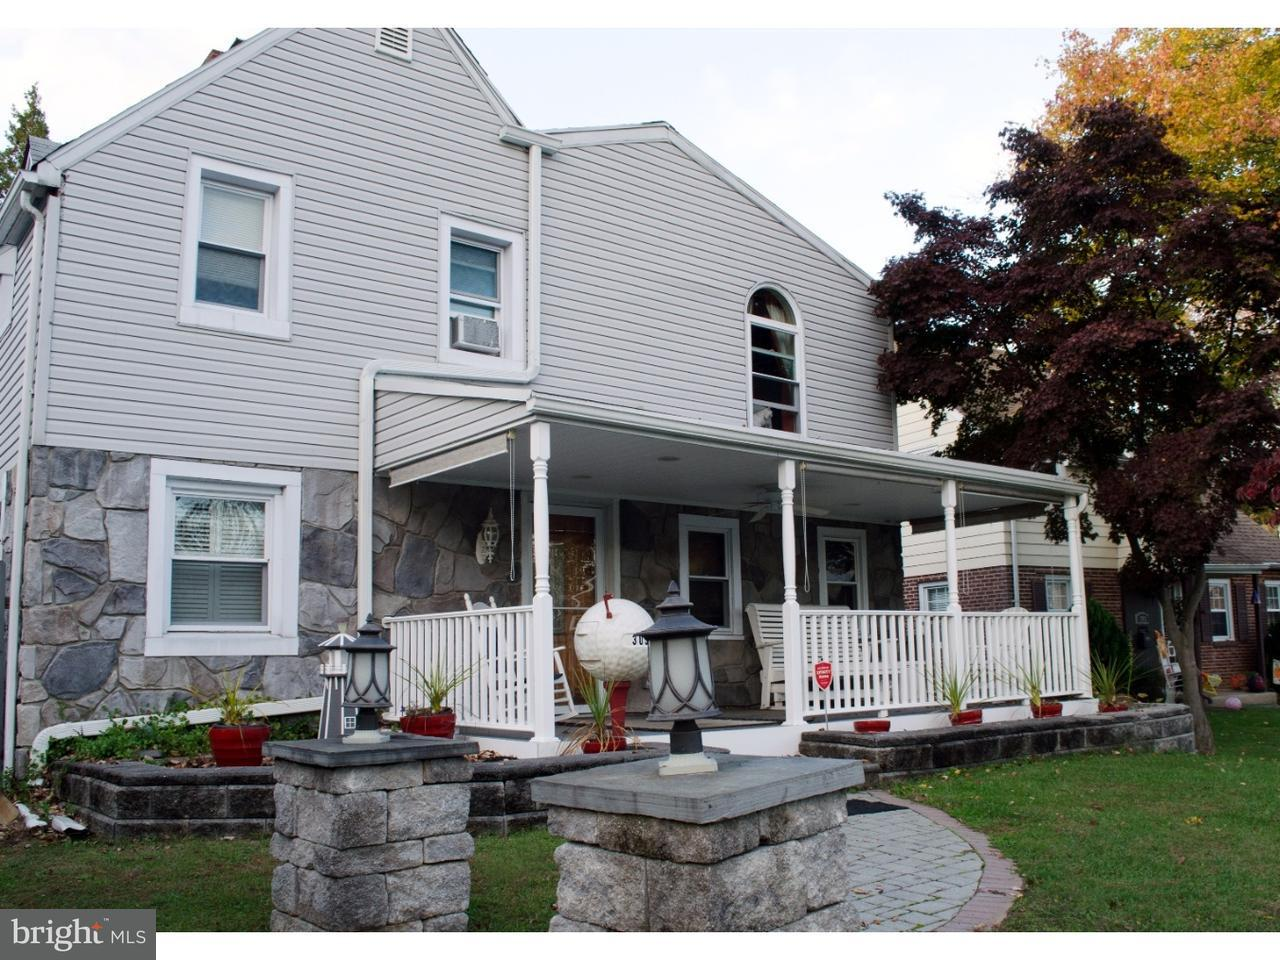 Single Family Home for Sale at 305 HARDING Avenue Folsom, Pennsylvania 19033 United States